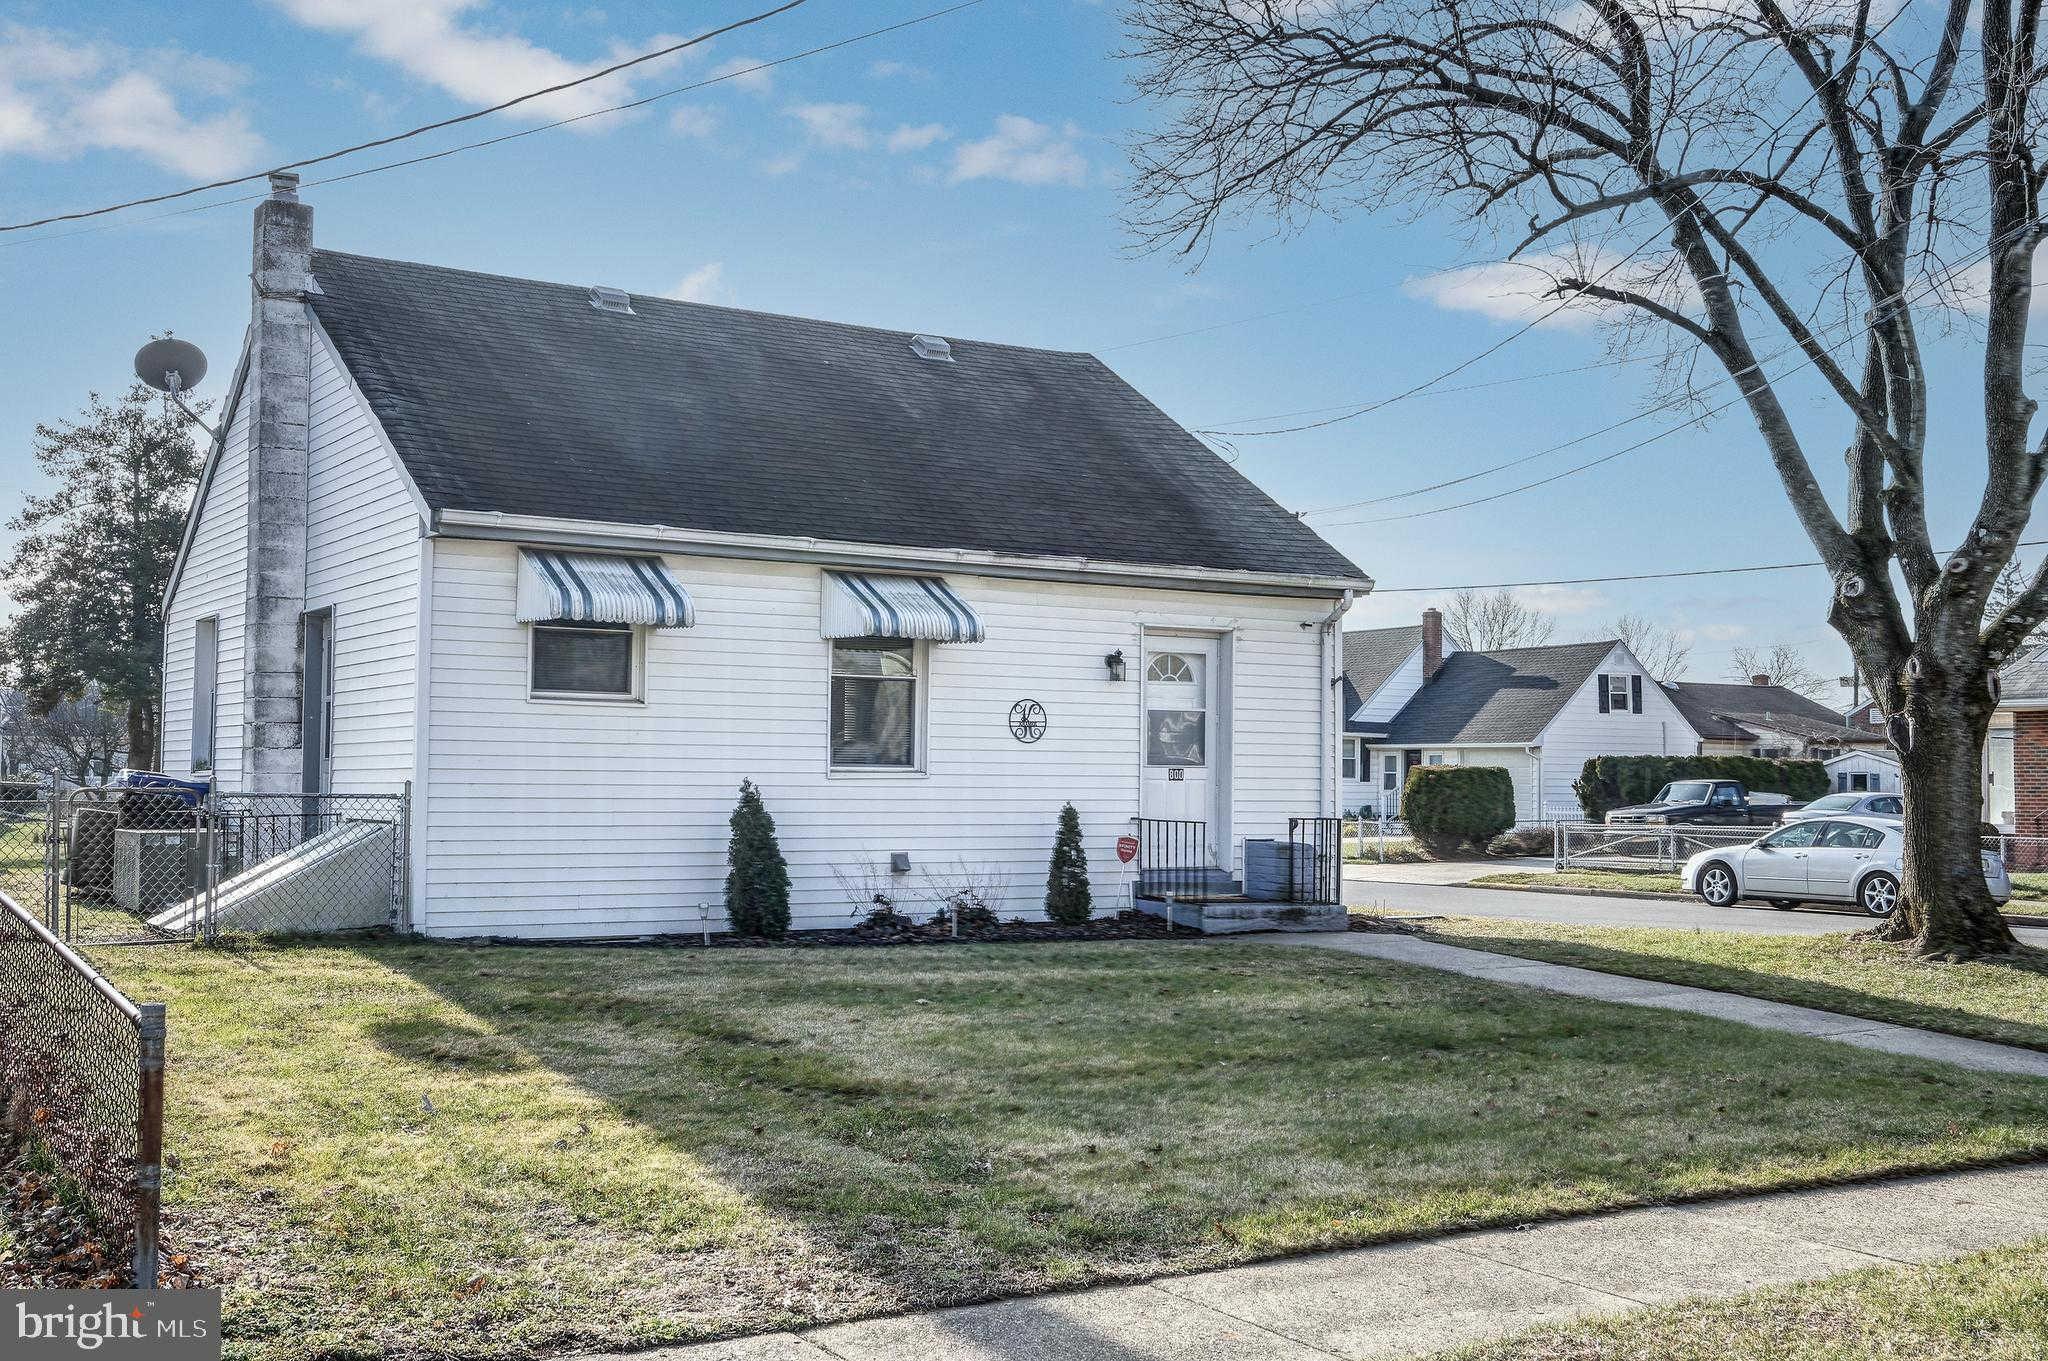 800 Bordentown Road, Burlington, NJ 08016 now has a new price of $151,900!